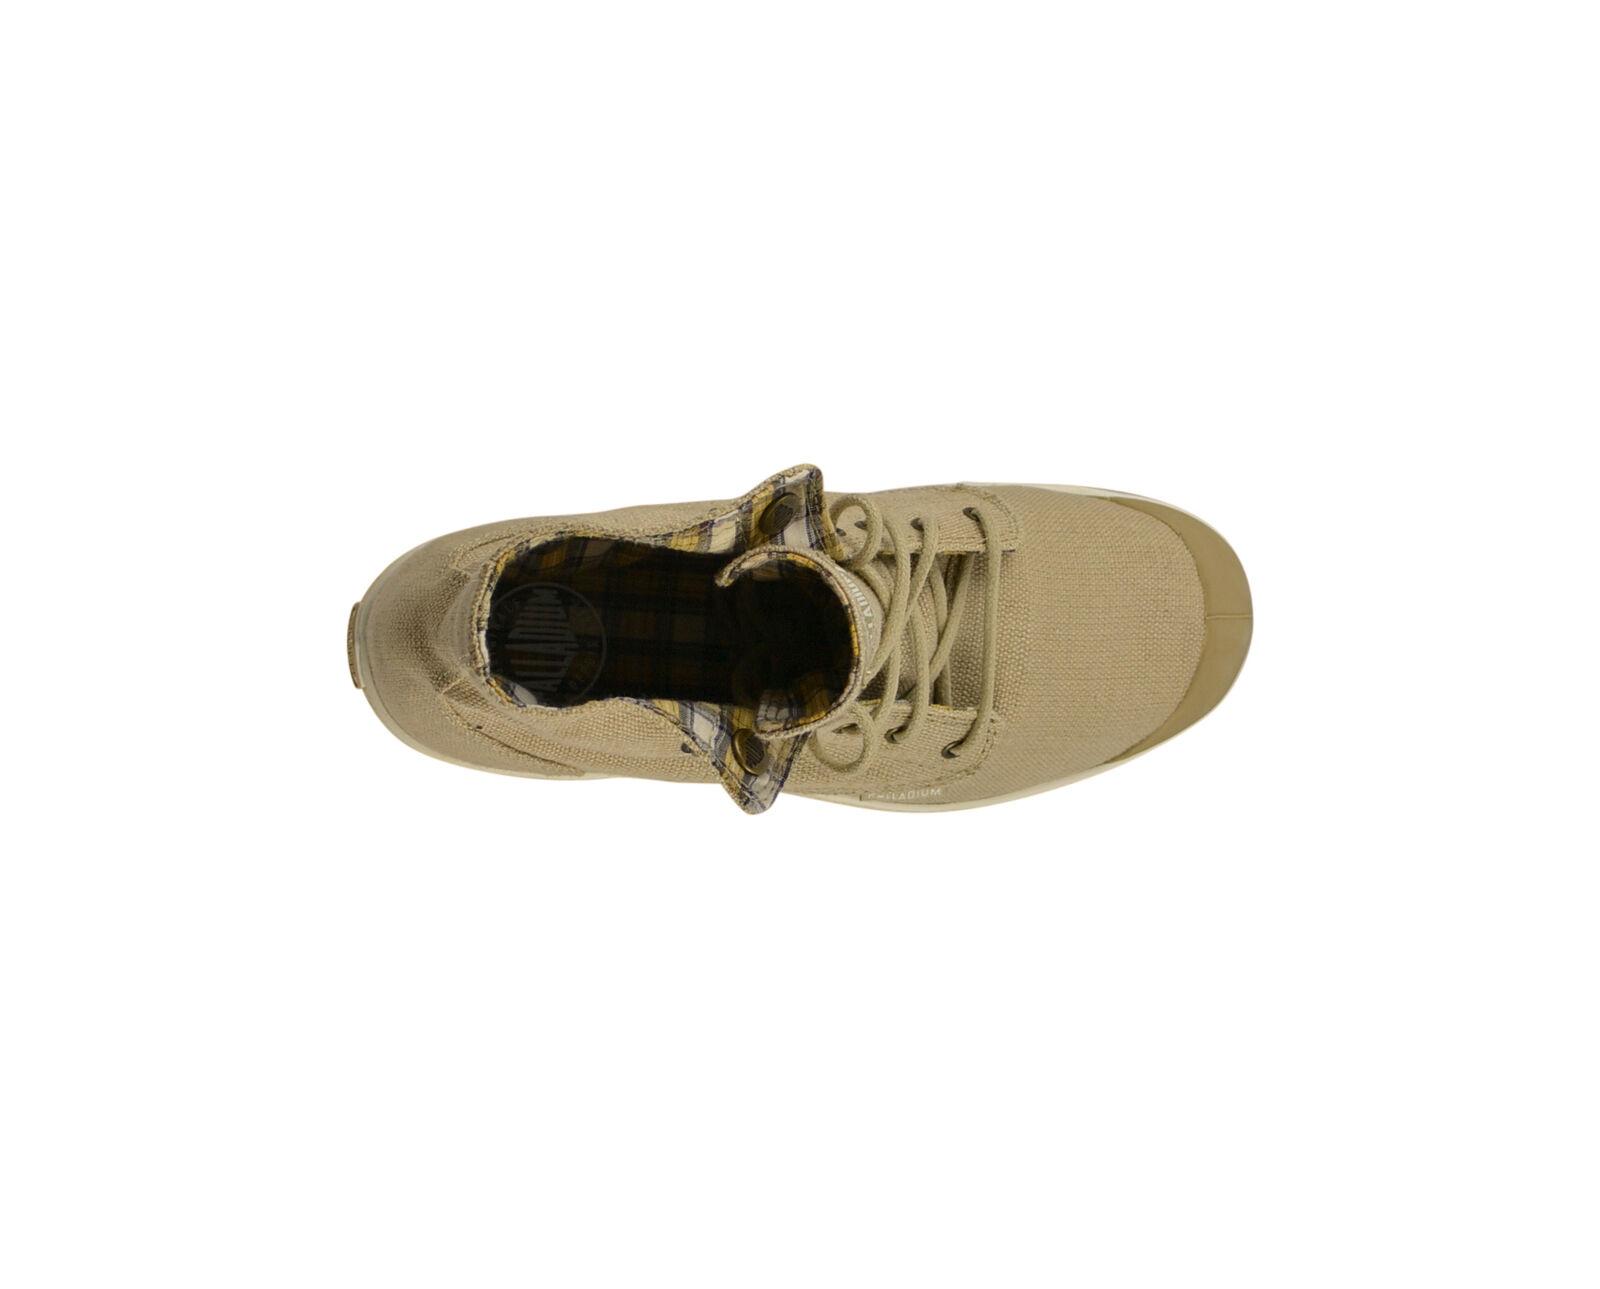 Palladium Slim Snaps safari/off white Schuhe/Sneaker beige